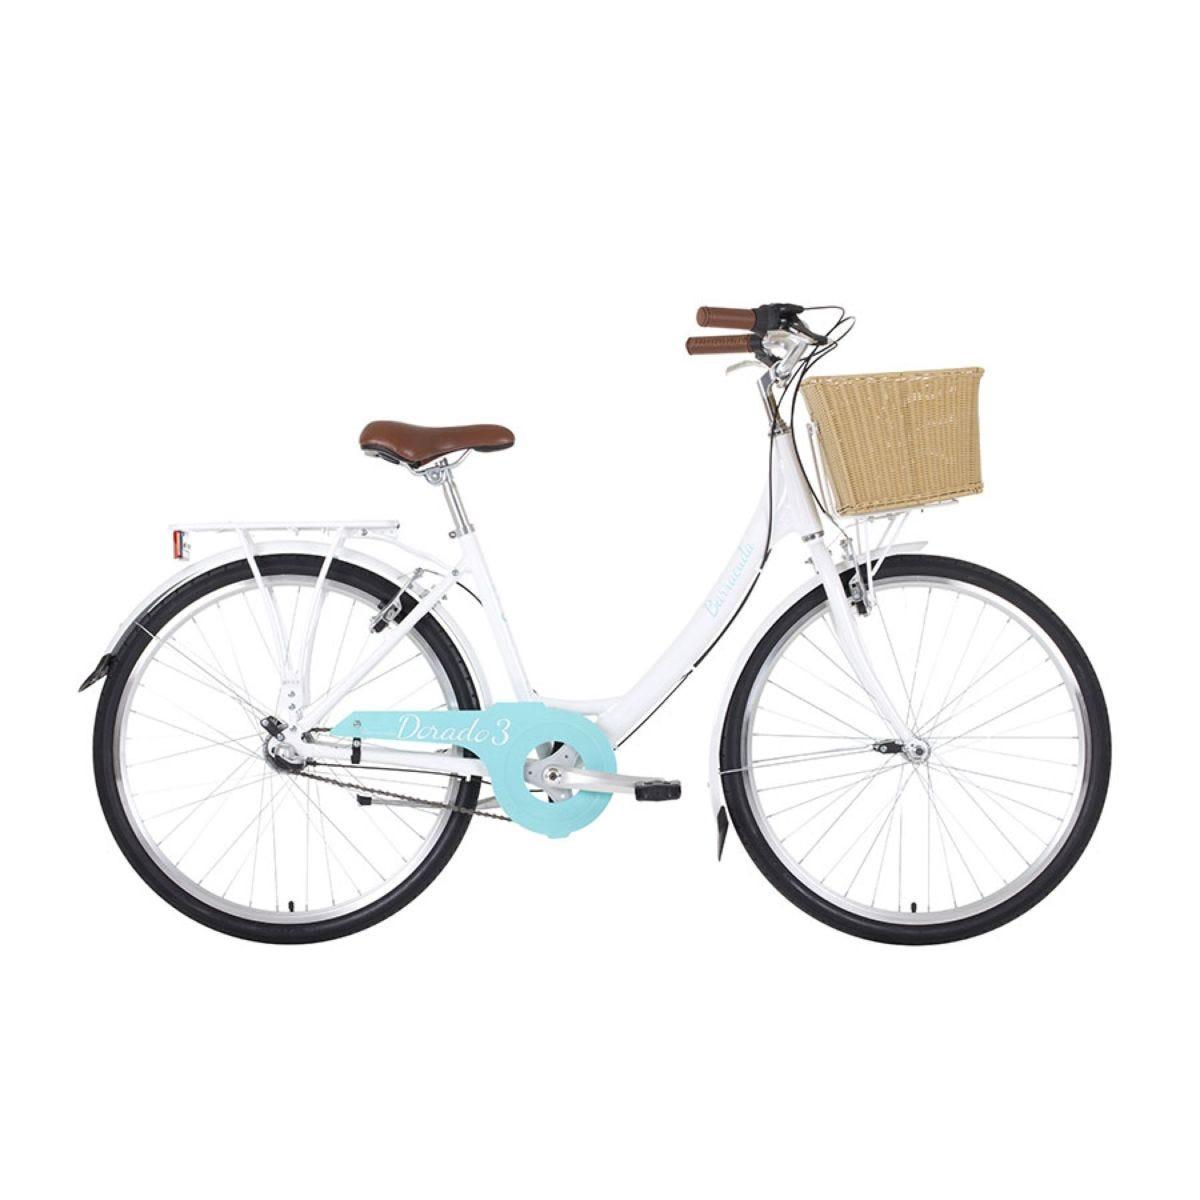 Barracuda Dorado 3 Woman's Commute Bike 26inch Wheel